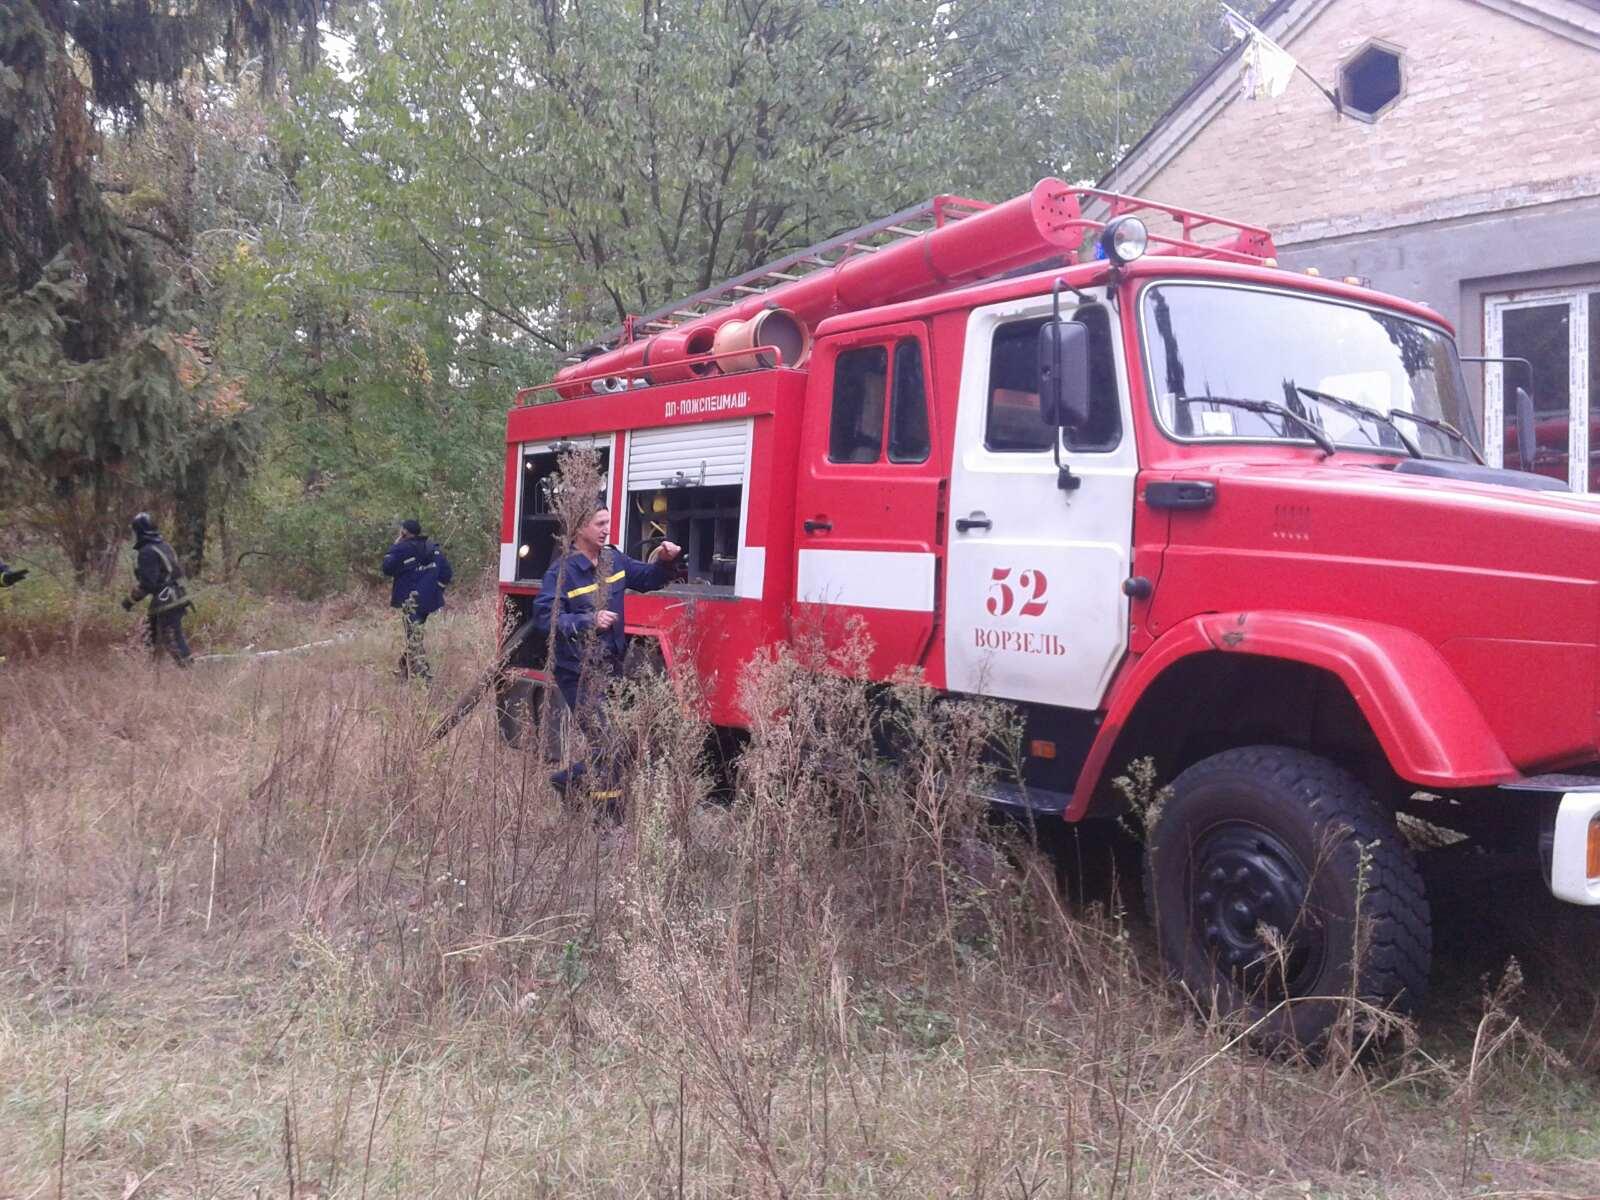 Пожежу у Ворзелі гасили 7 осіб та 3 машини -  - 0 02 04 e0a7ca00fdc020da9dd7373062c40c89e08c118f95745a5668f02bf18a7c4a13 163bb07c